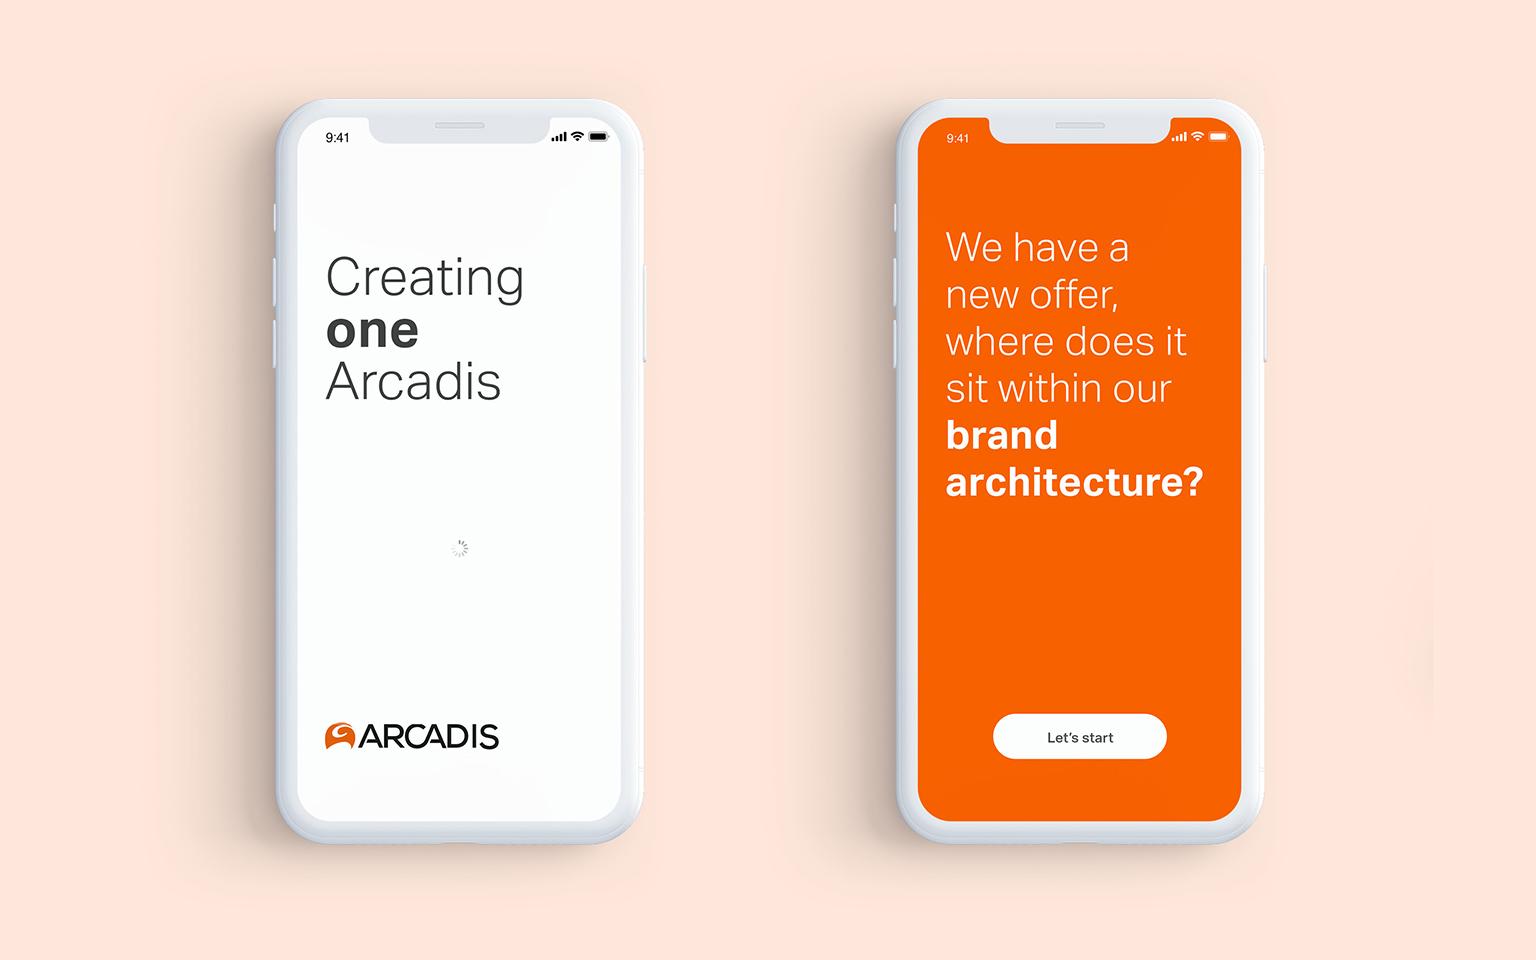 Arcadis brand architecture